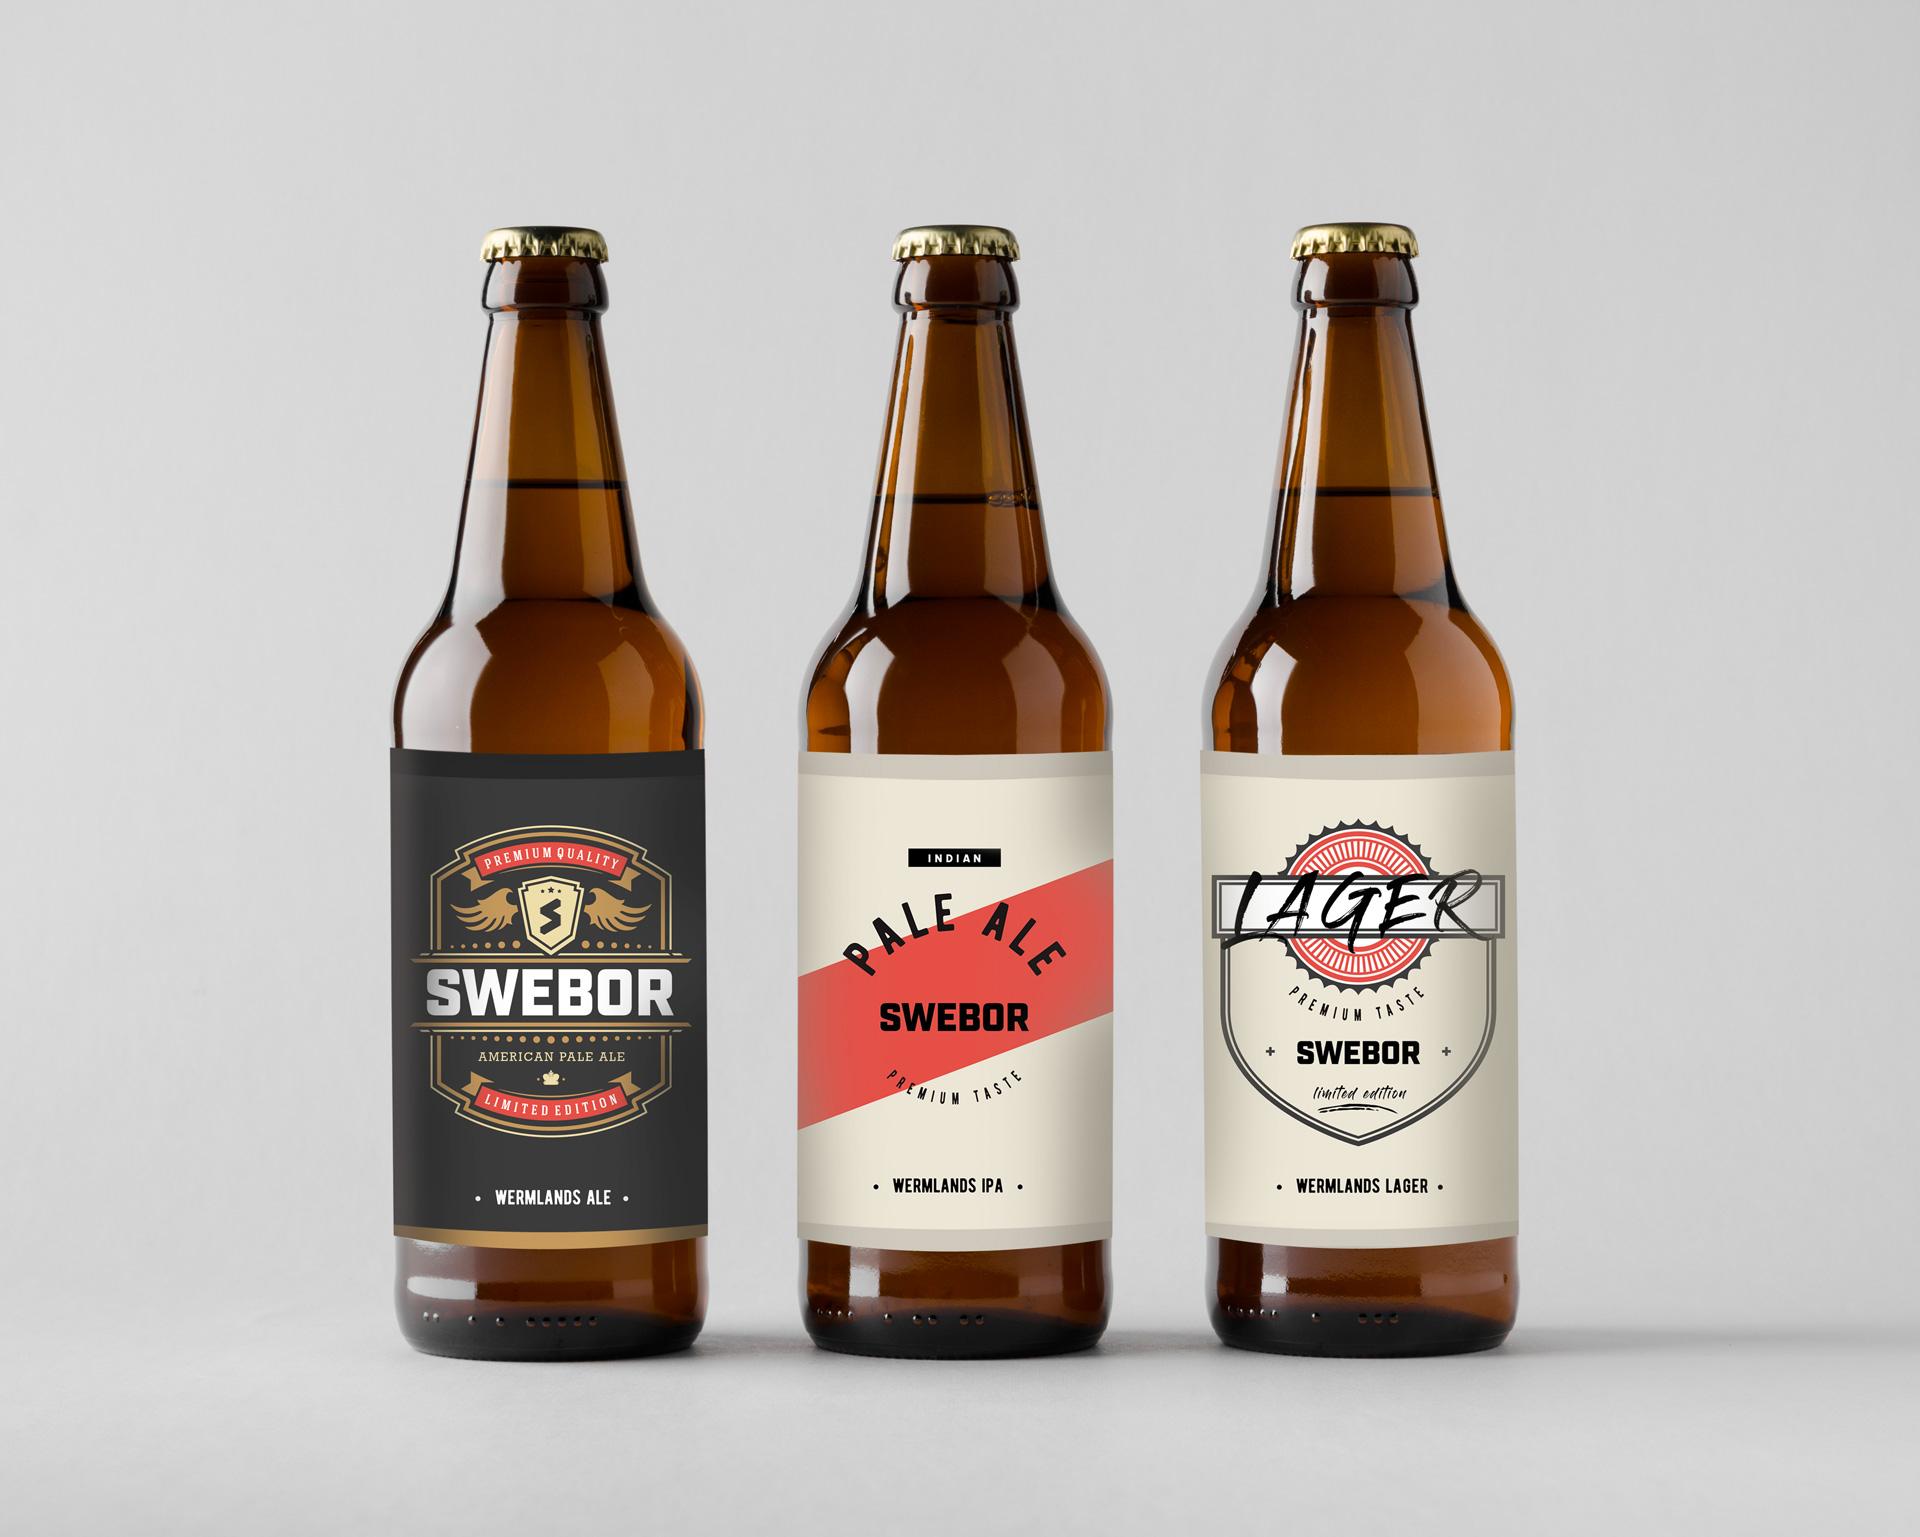 swebor-beer.jpg